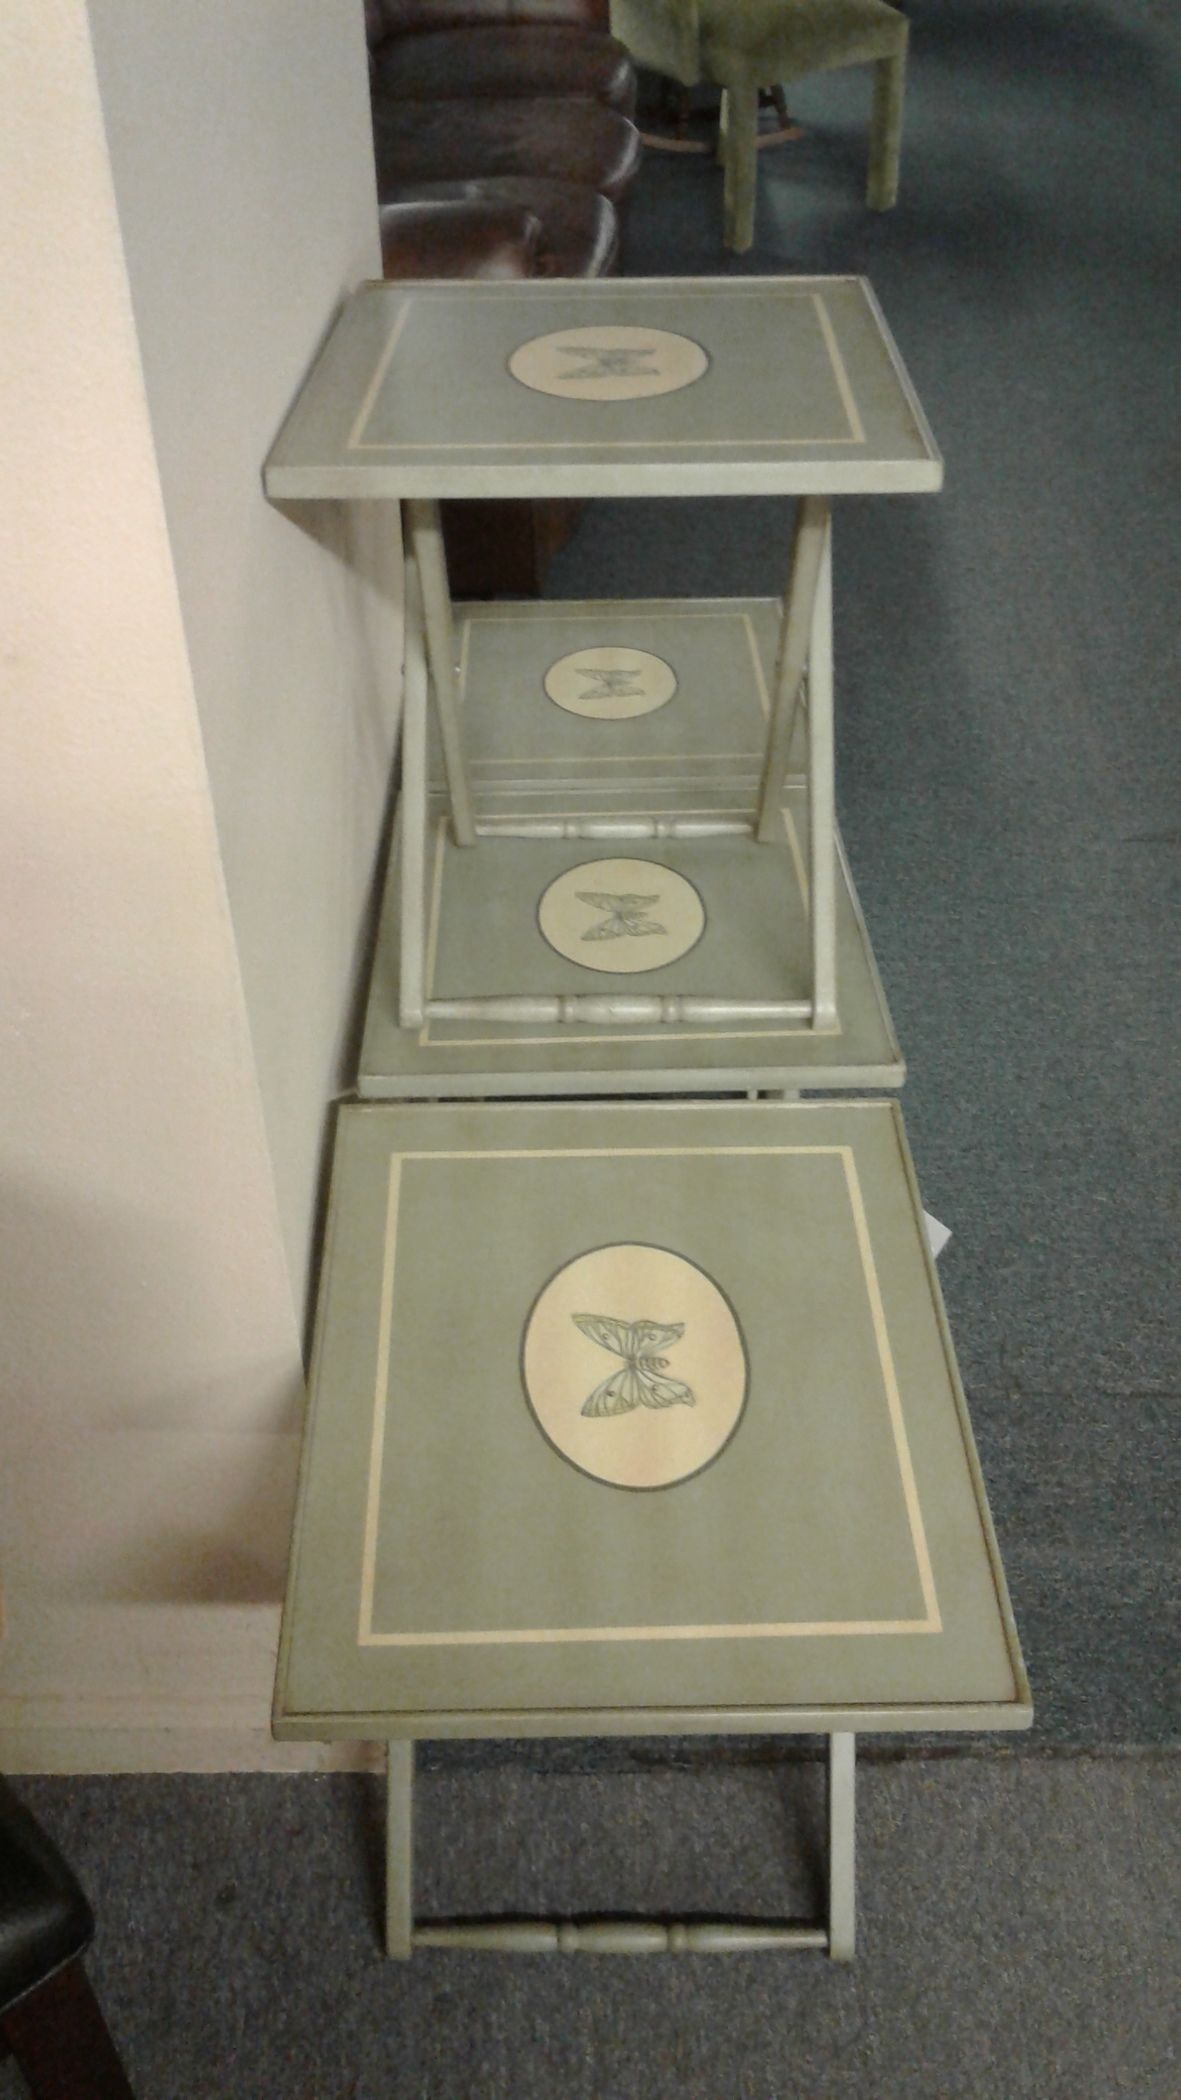 4 Folding Snack Trays Delmarva Furniture Consignment